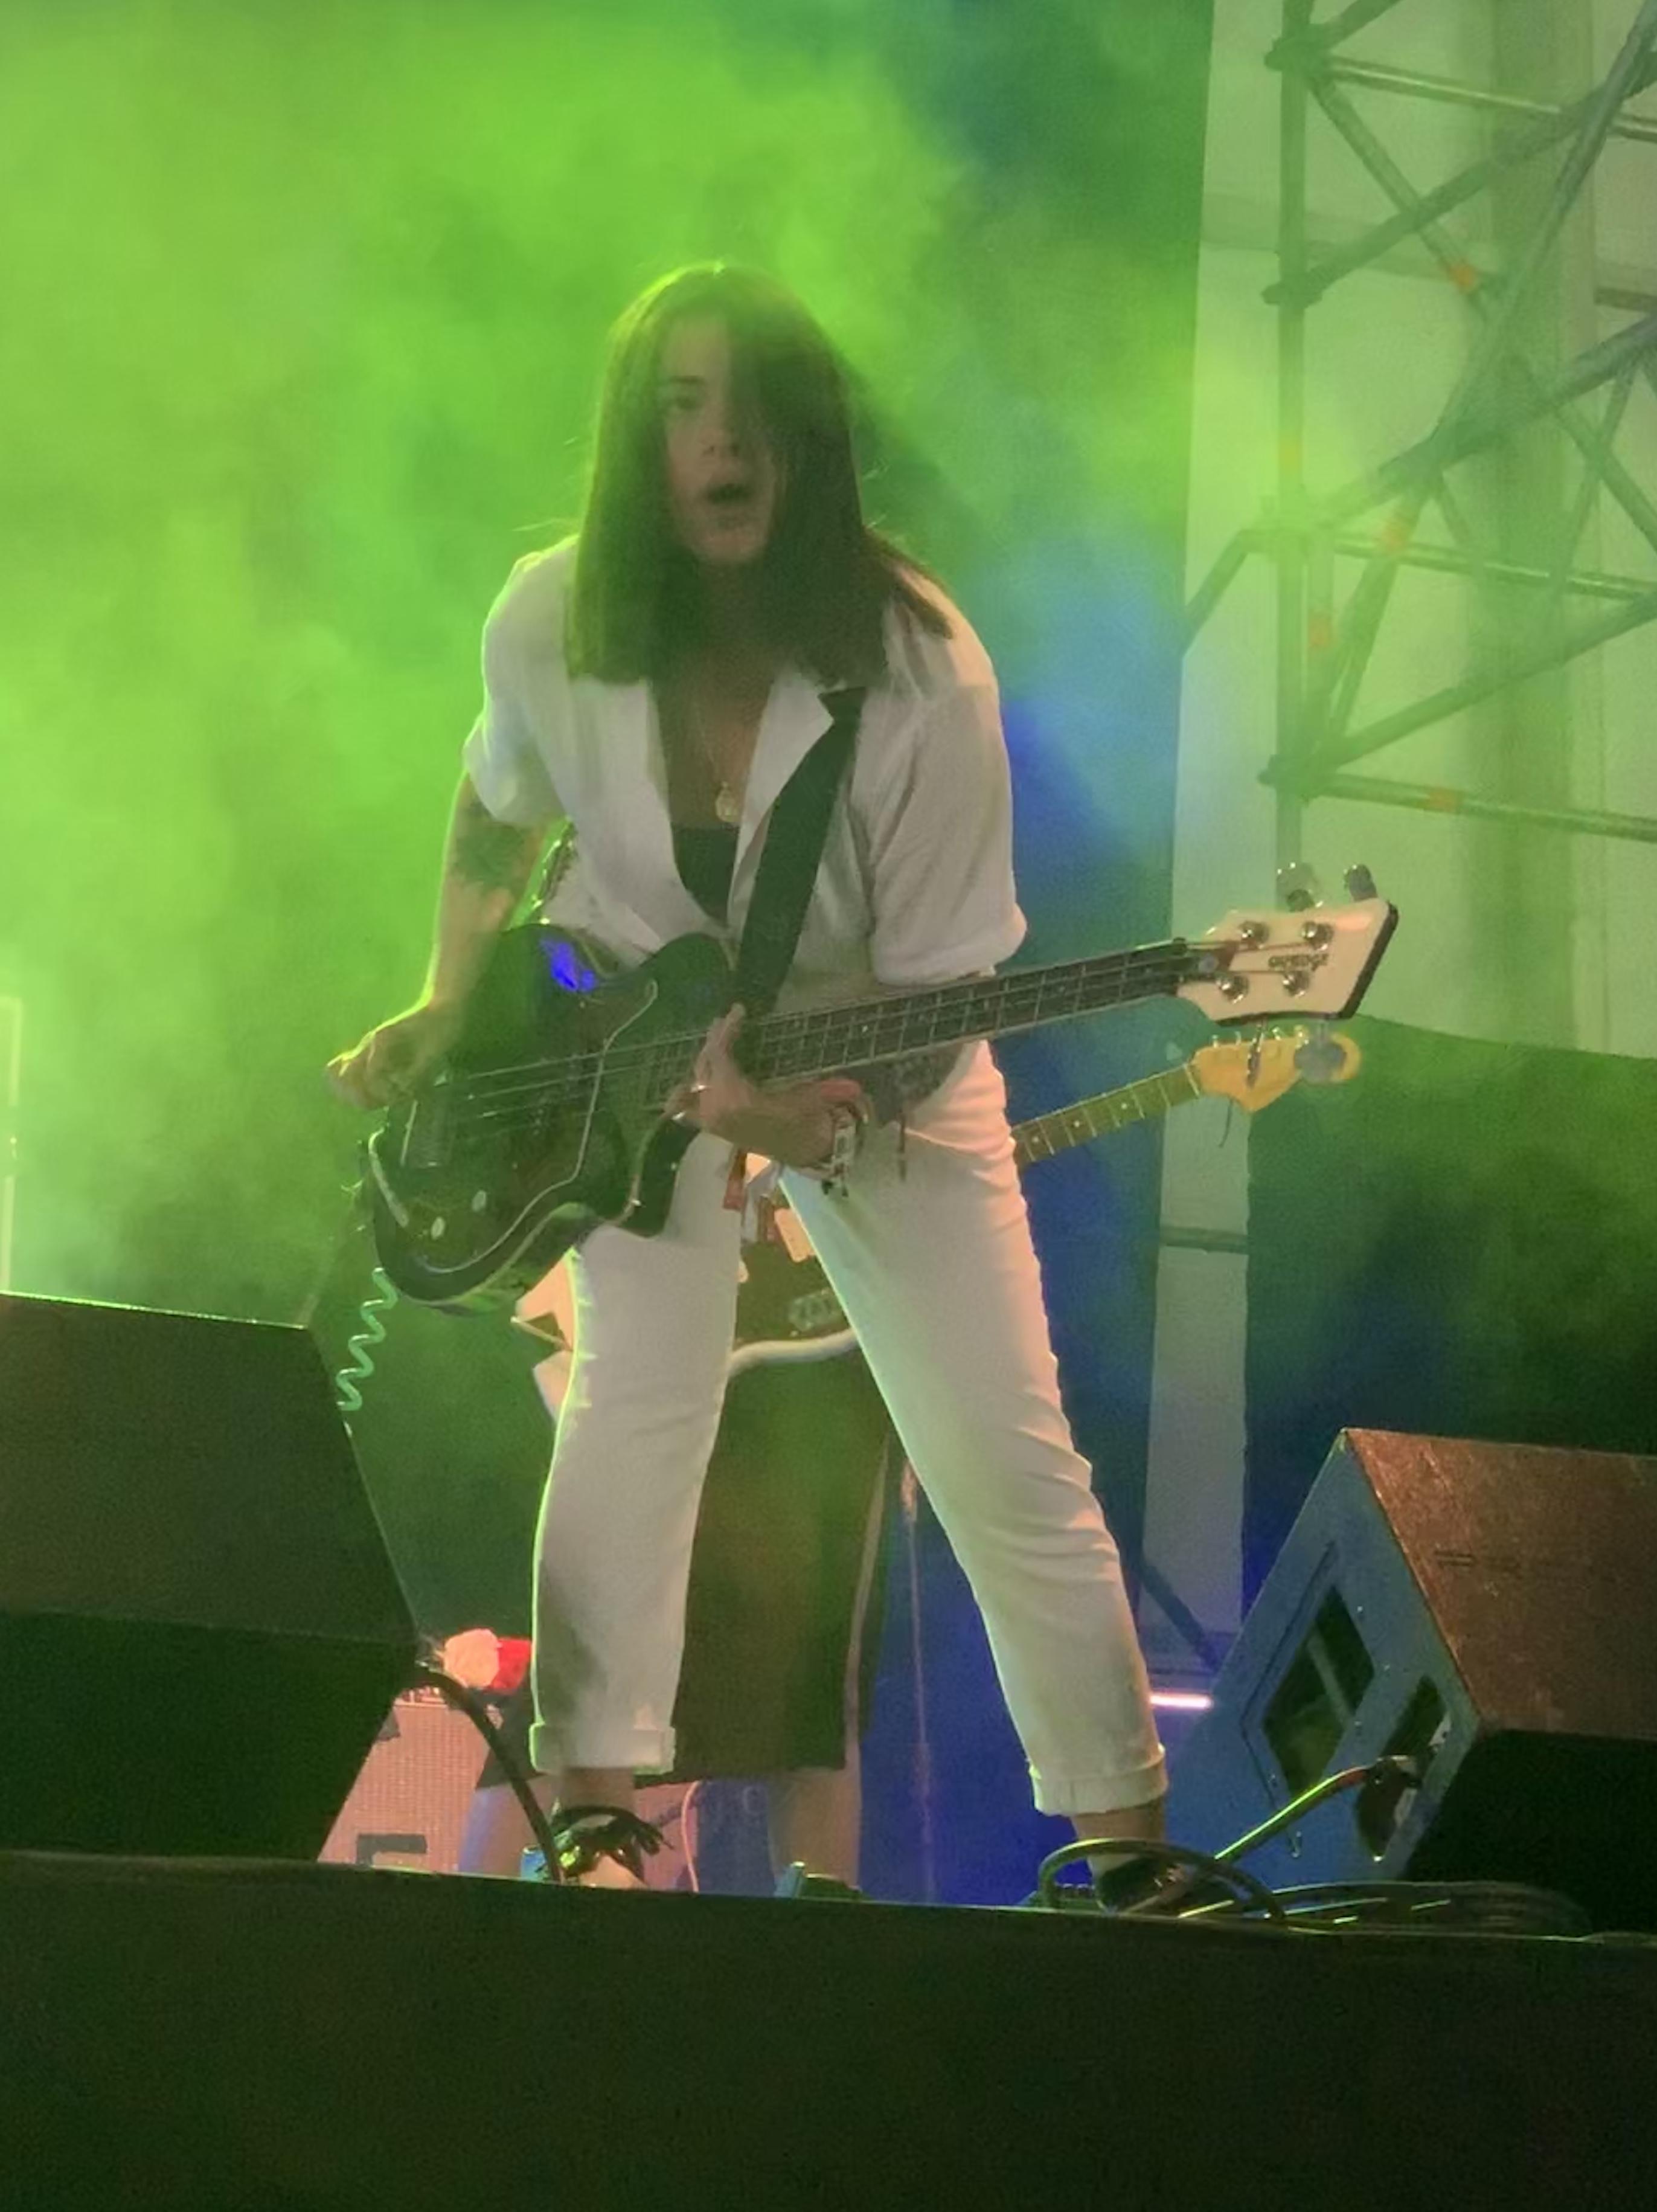 Valeras lead singer and bassist Rose Yagmur